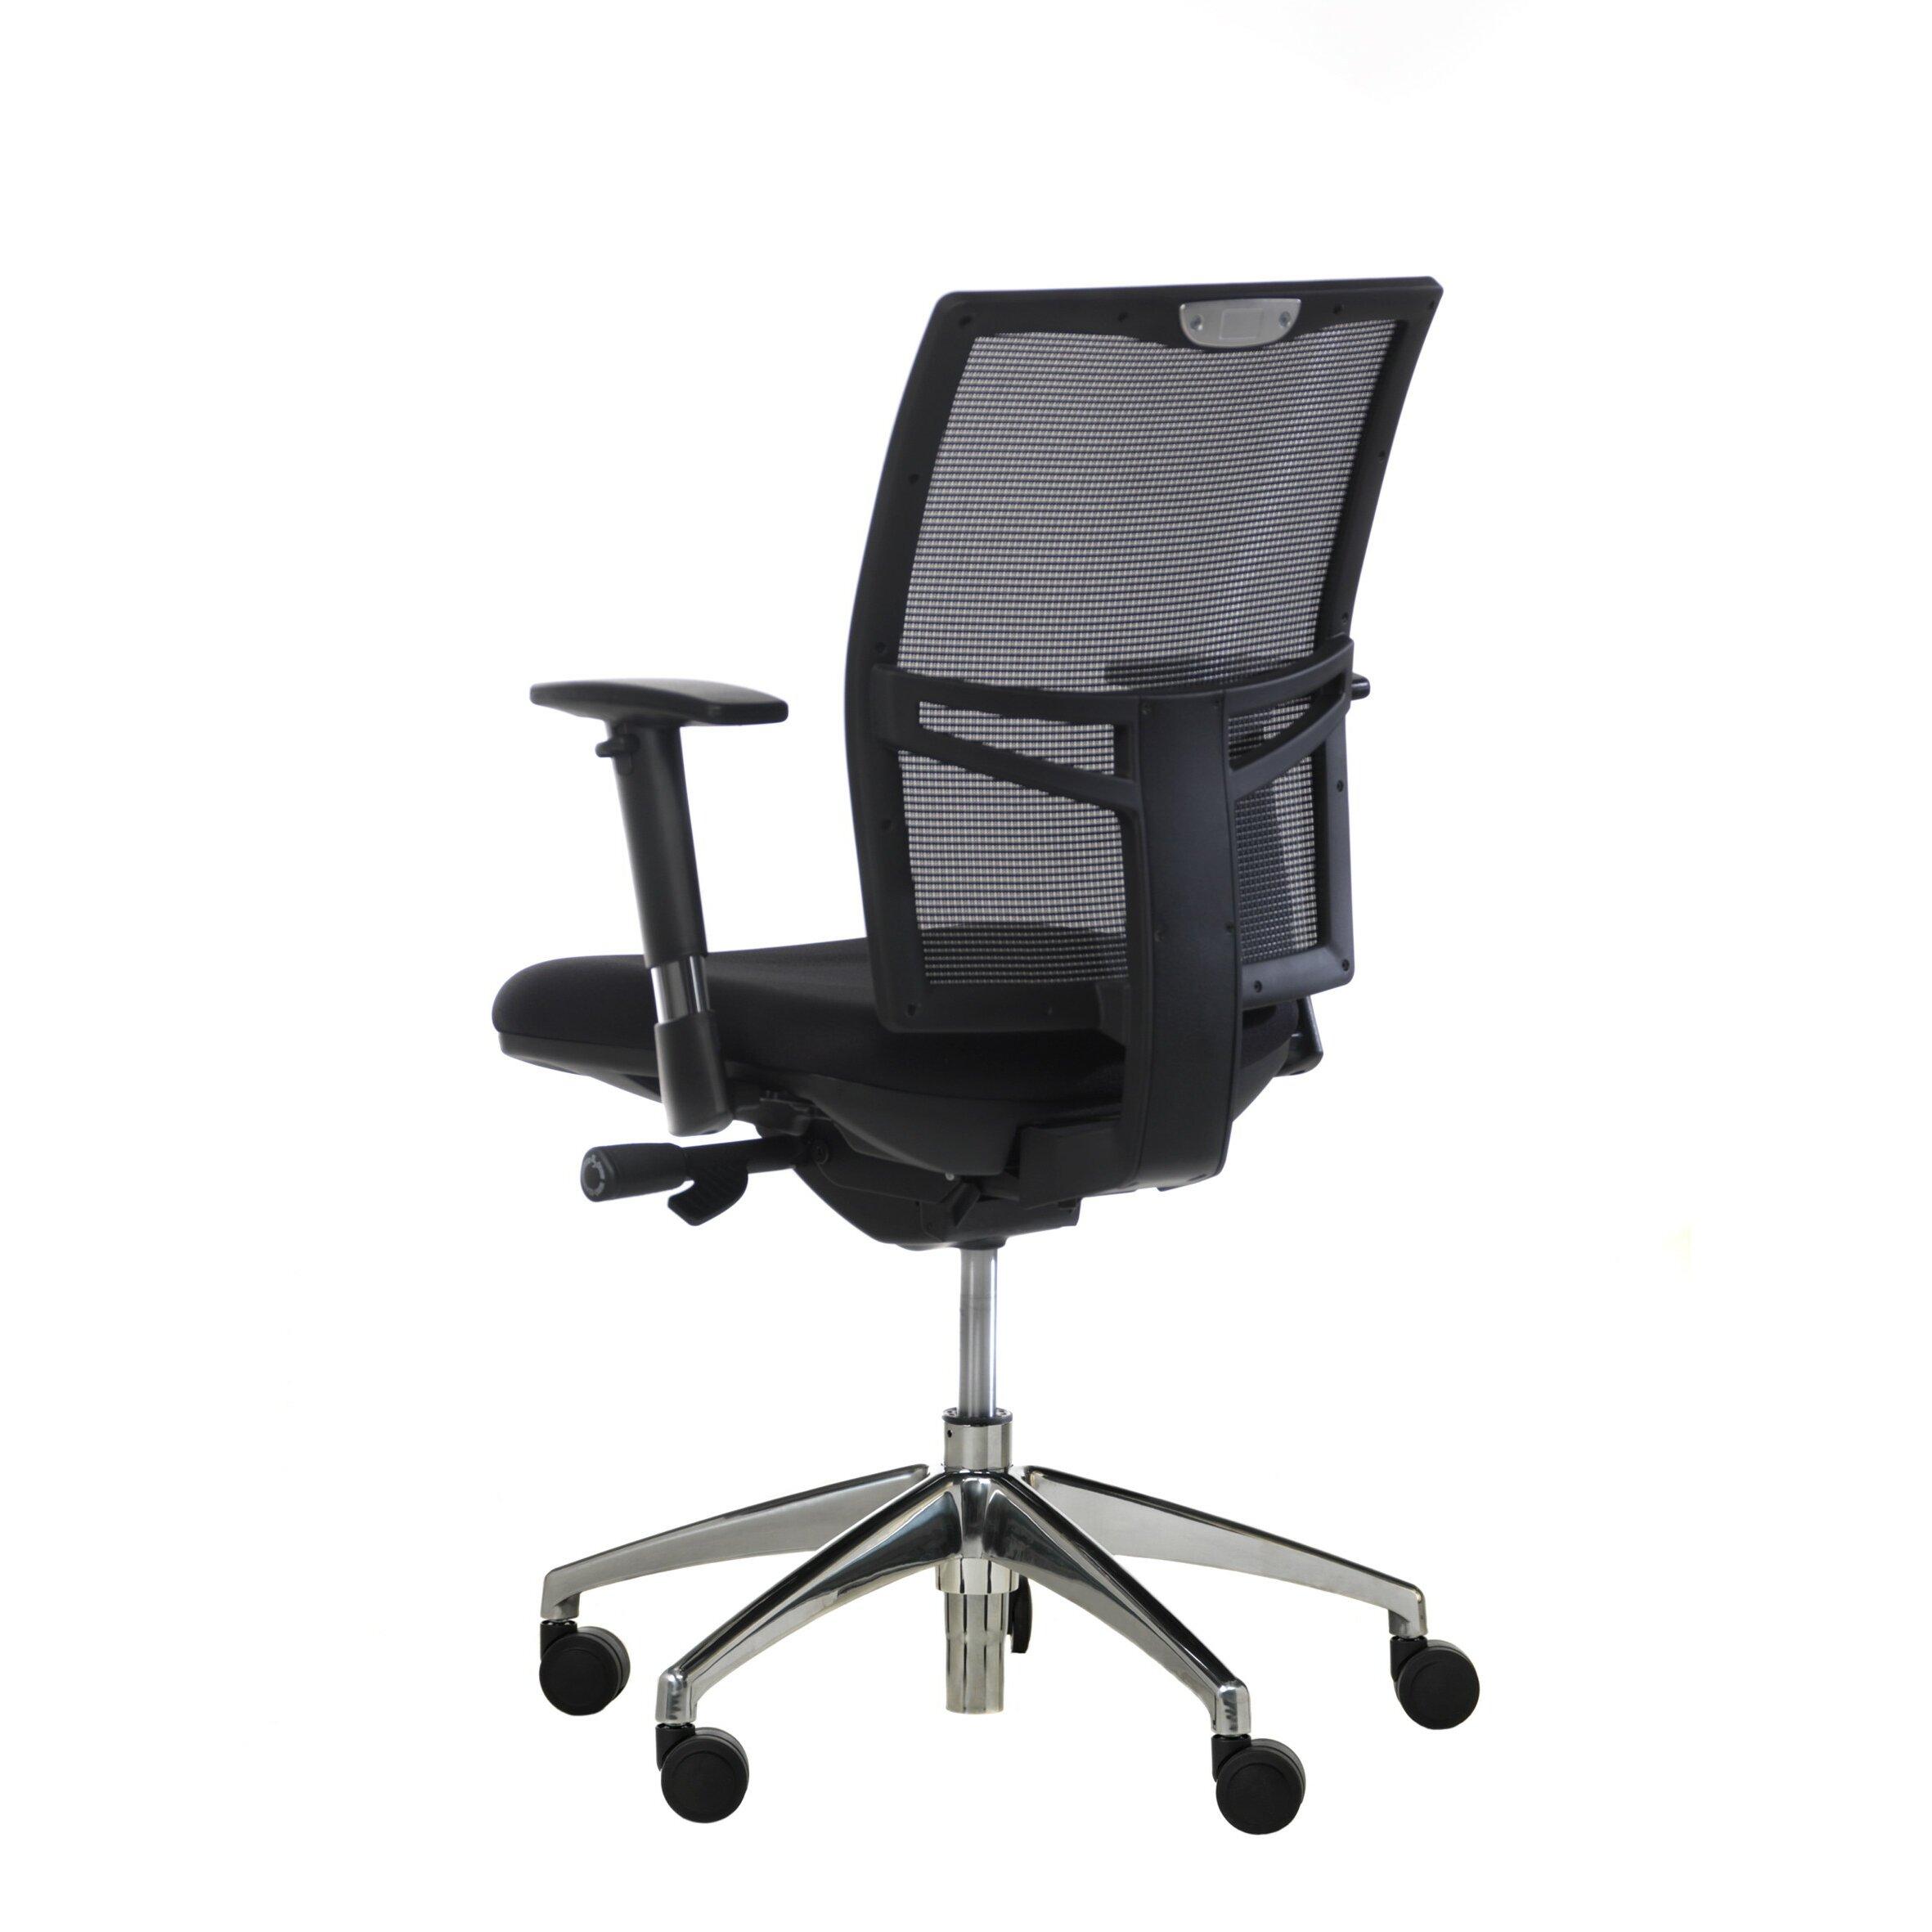 Synergie strategie mid back ergonomic mesh task chair with arms allmodern - Ergo kids task chair ...